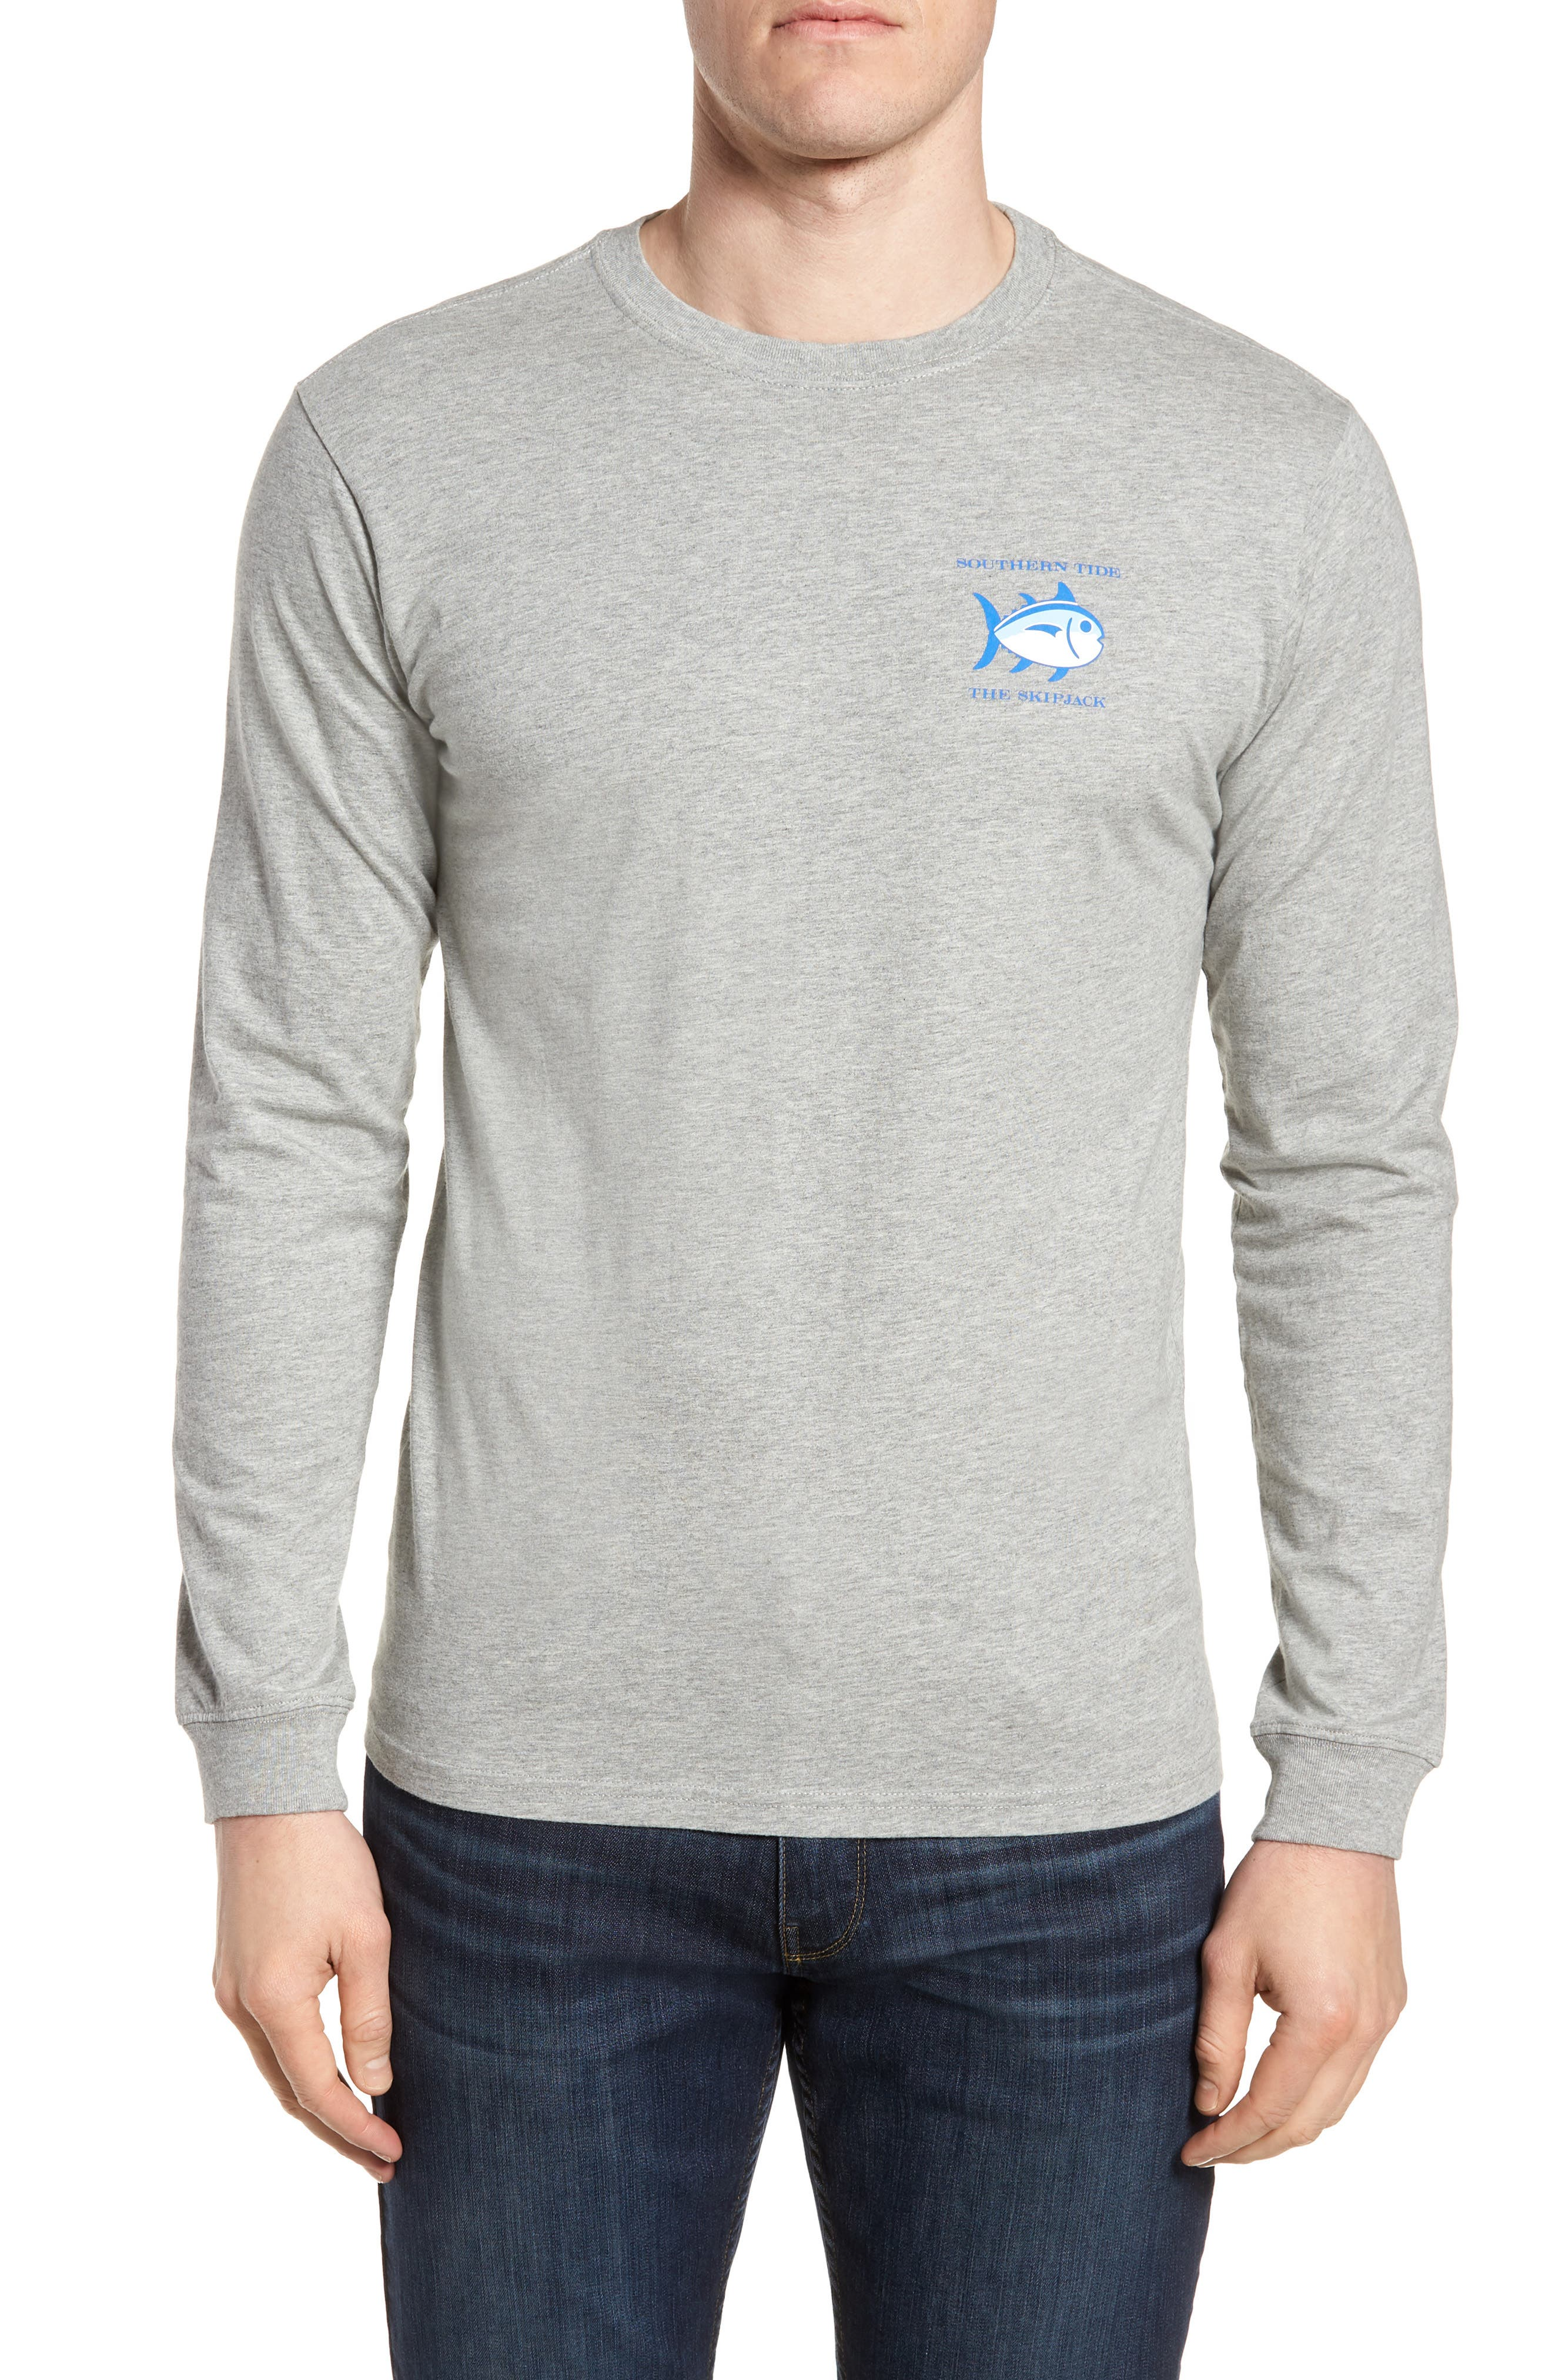 Original Skipjack T-Shirt,                         Main,                         color, Grey